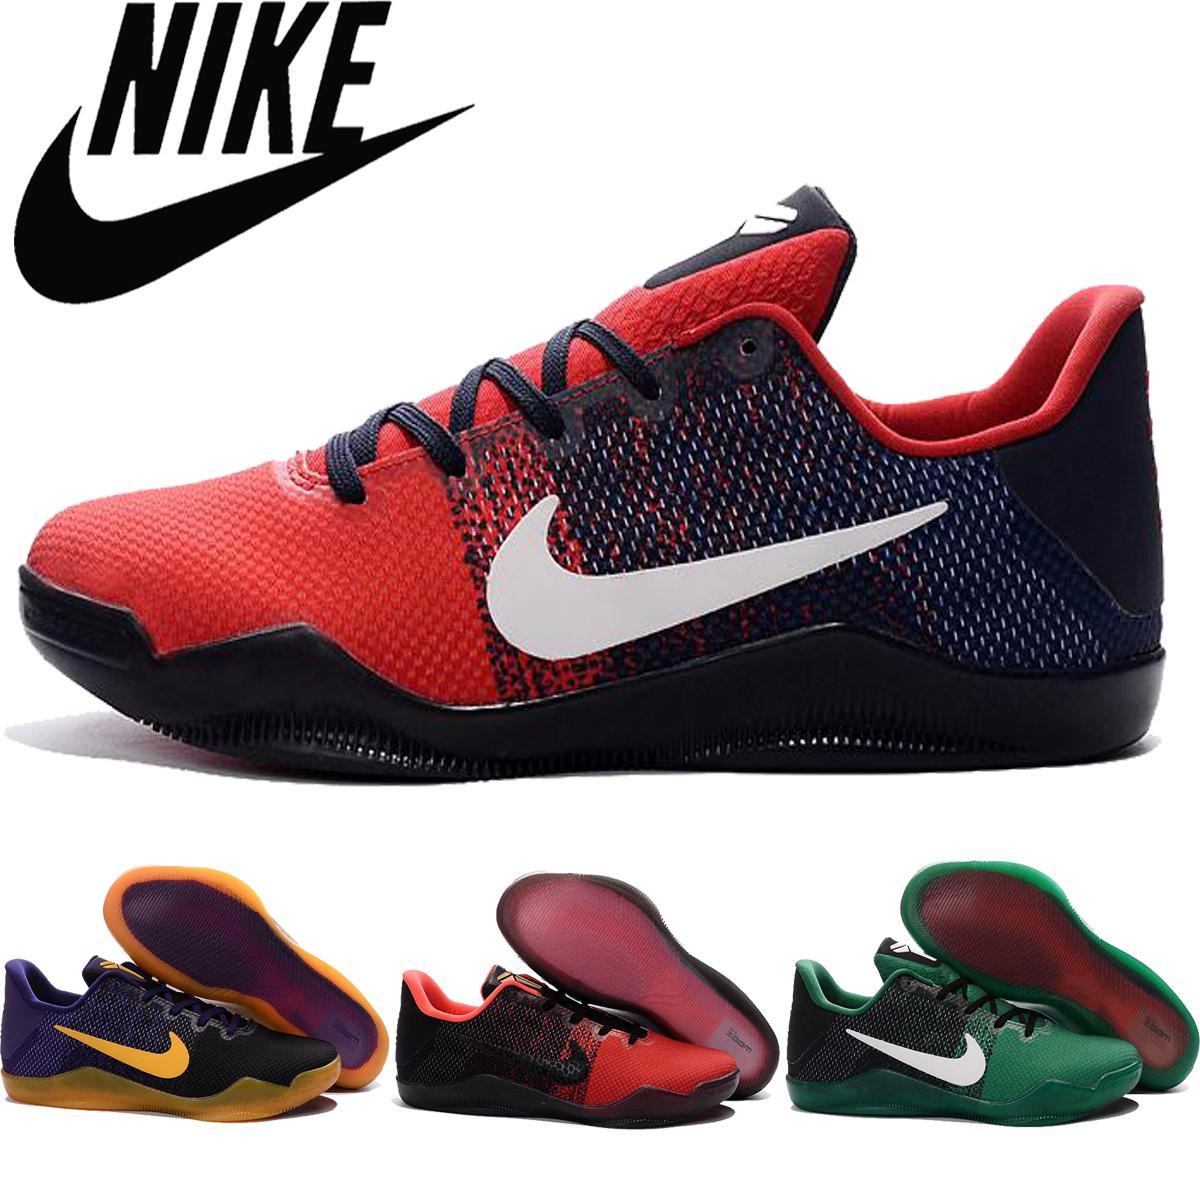 info for ef69b 24dd4 Nike Kobe 11 KOBE XI Low Men Basketball Shoes,Wholesale Original Quality  Kobe Bryant For Mens Sports Shoes Cheap Kobe11 Sneakers Size 7 12 Shoes  Sports ...